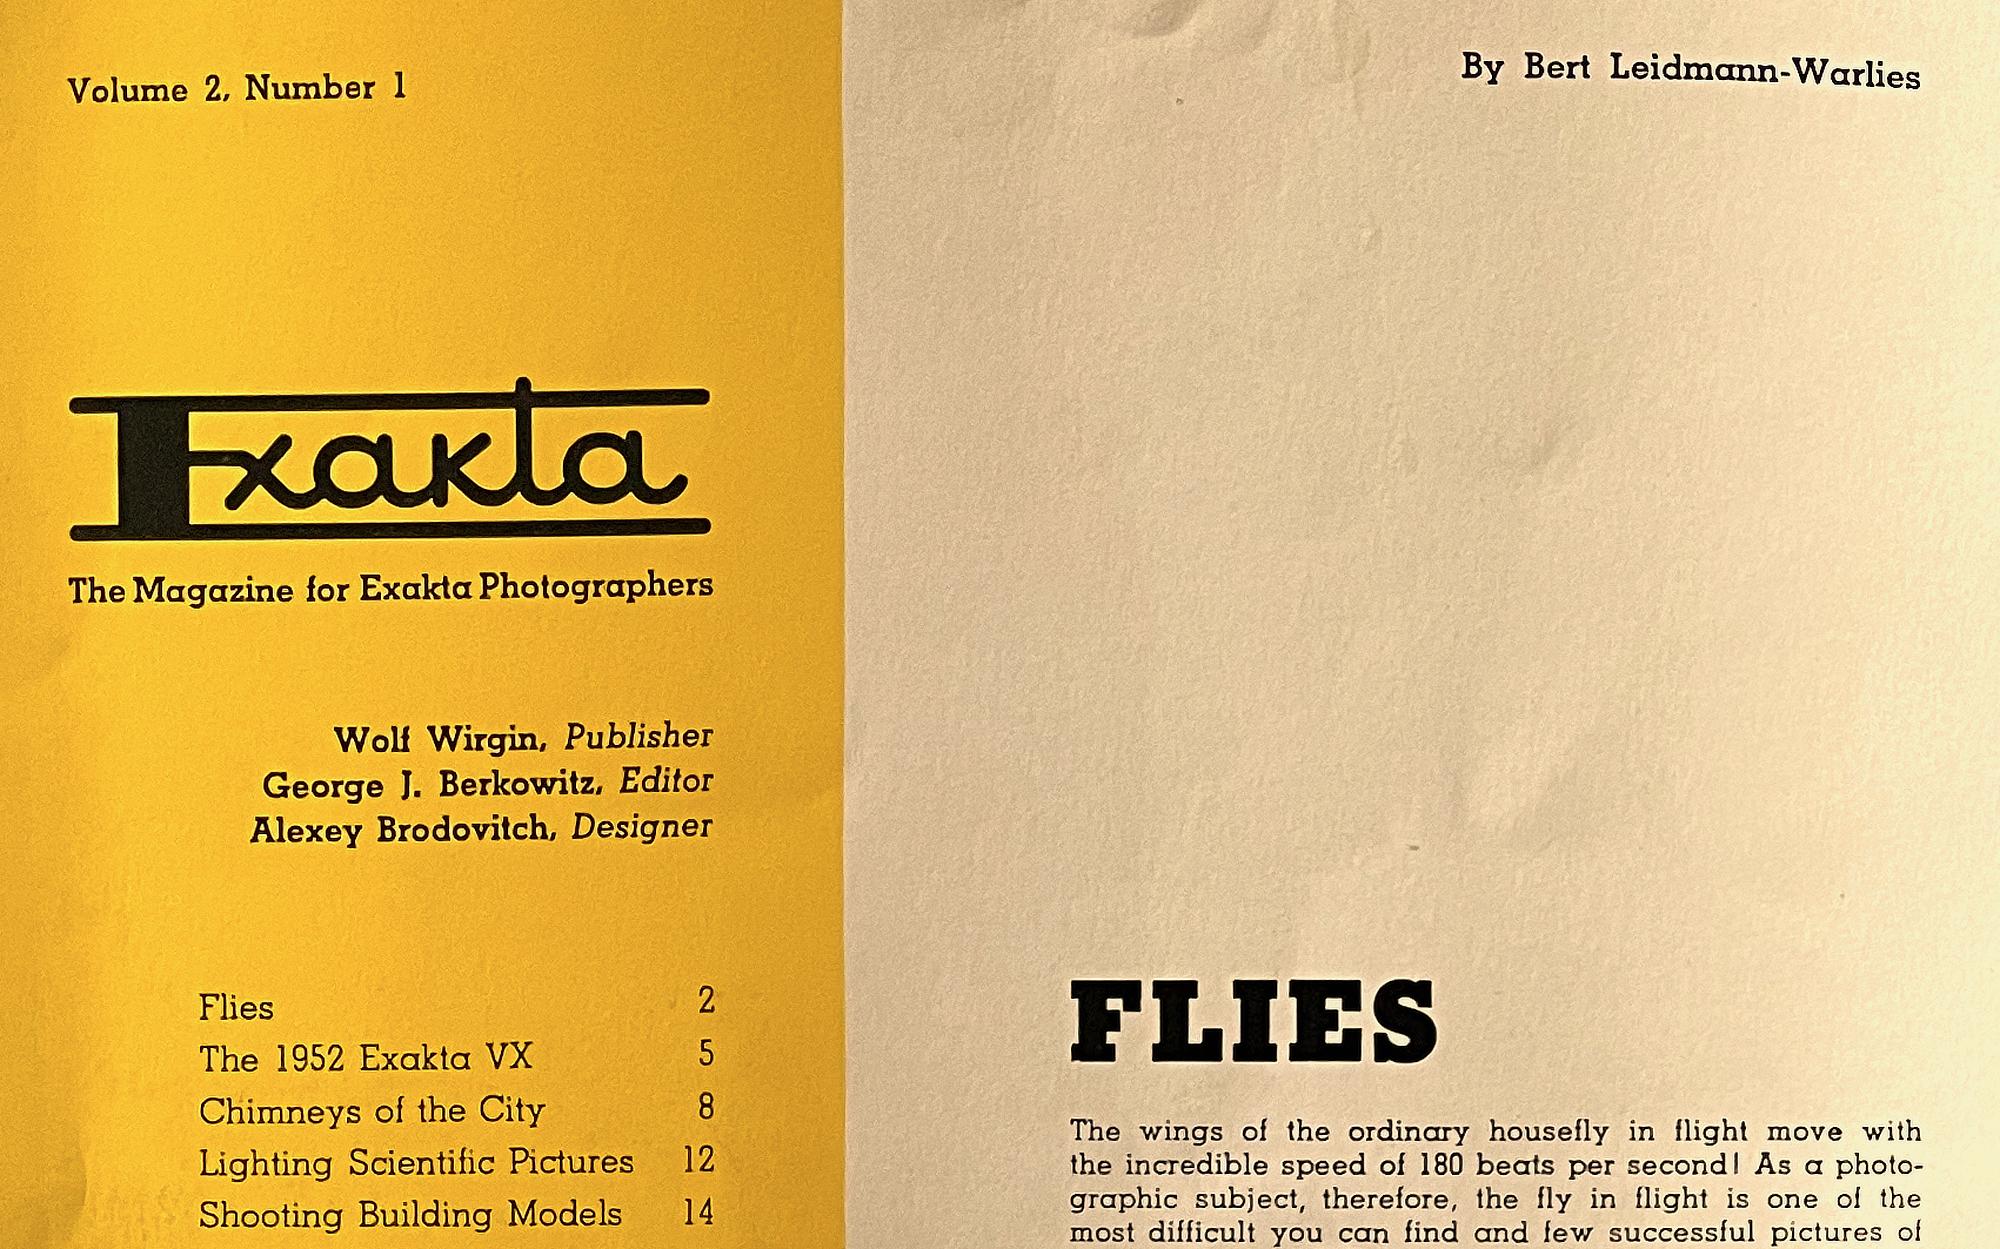 Alexey Brodovitch's Forgotten Design for Exakta Magazine